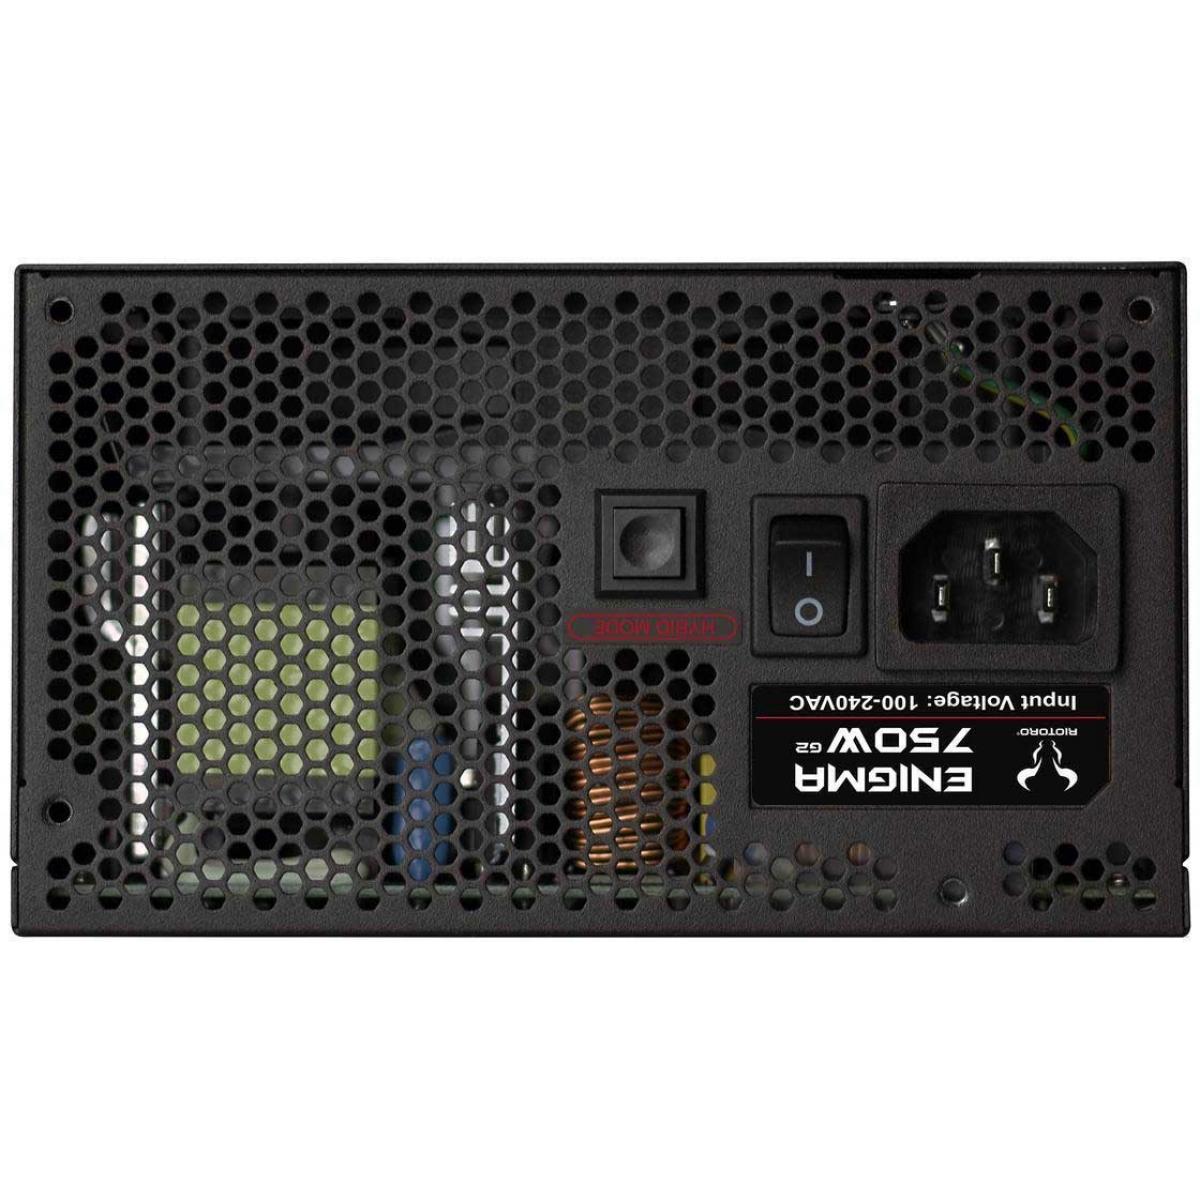 Fonte Riotoro Enigma G2 750W, 80 Plus Gold, PFC Ativo, Full Modular, PR-GP0750-FMG2-NA